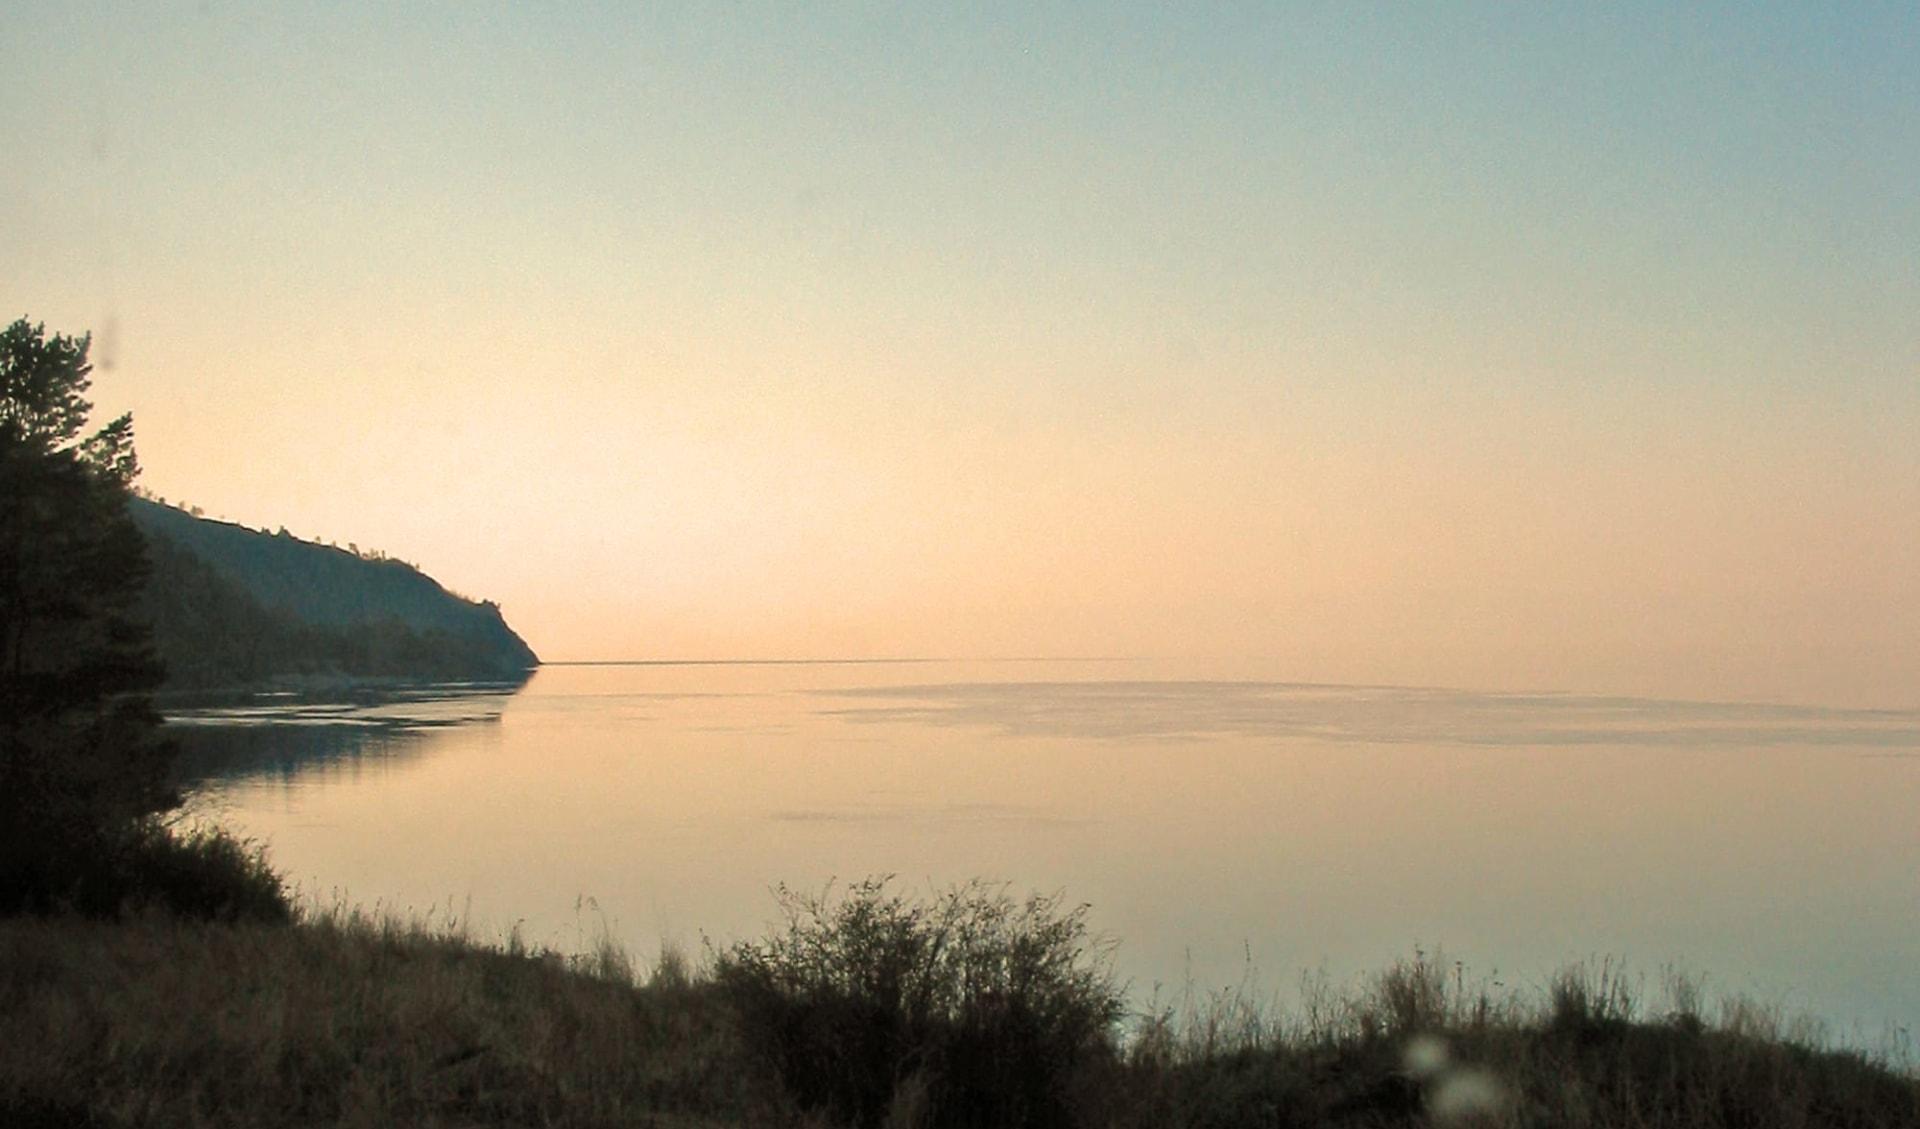 Naturwunder Baikalsee ab Irkutsk: Russland - Baikalsee - Sonnenuntergang